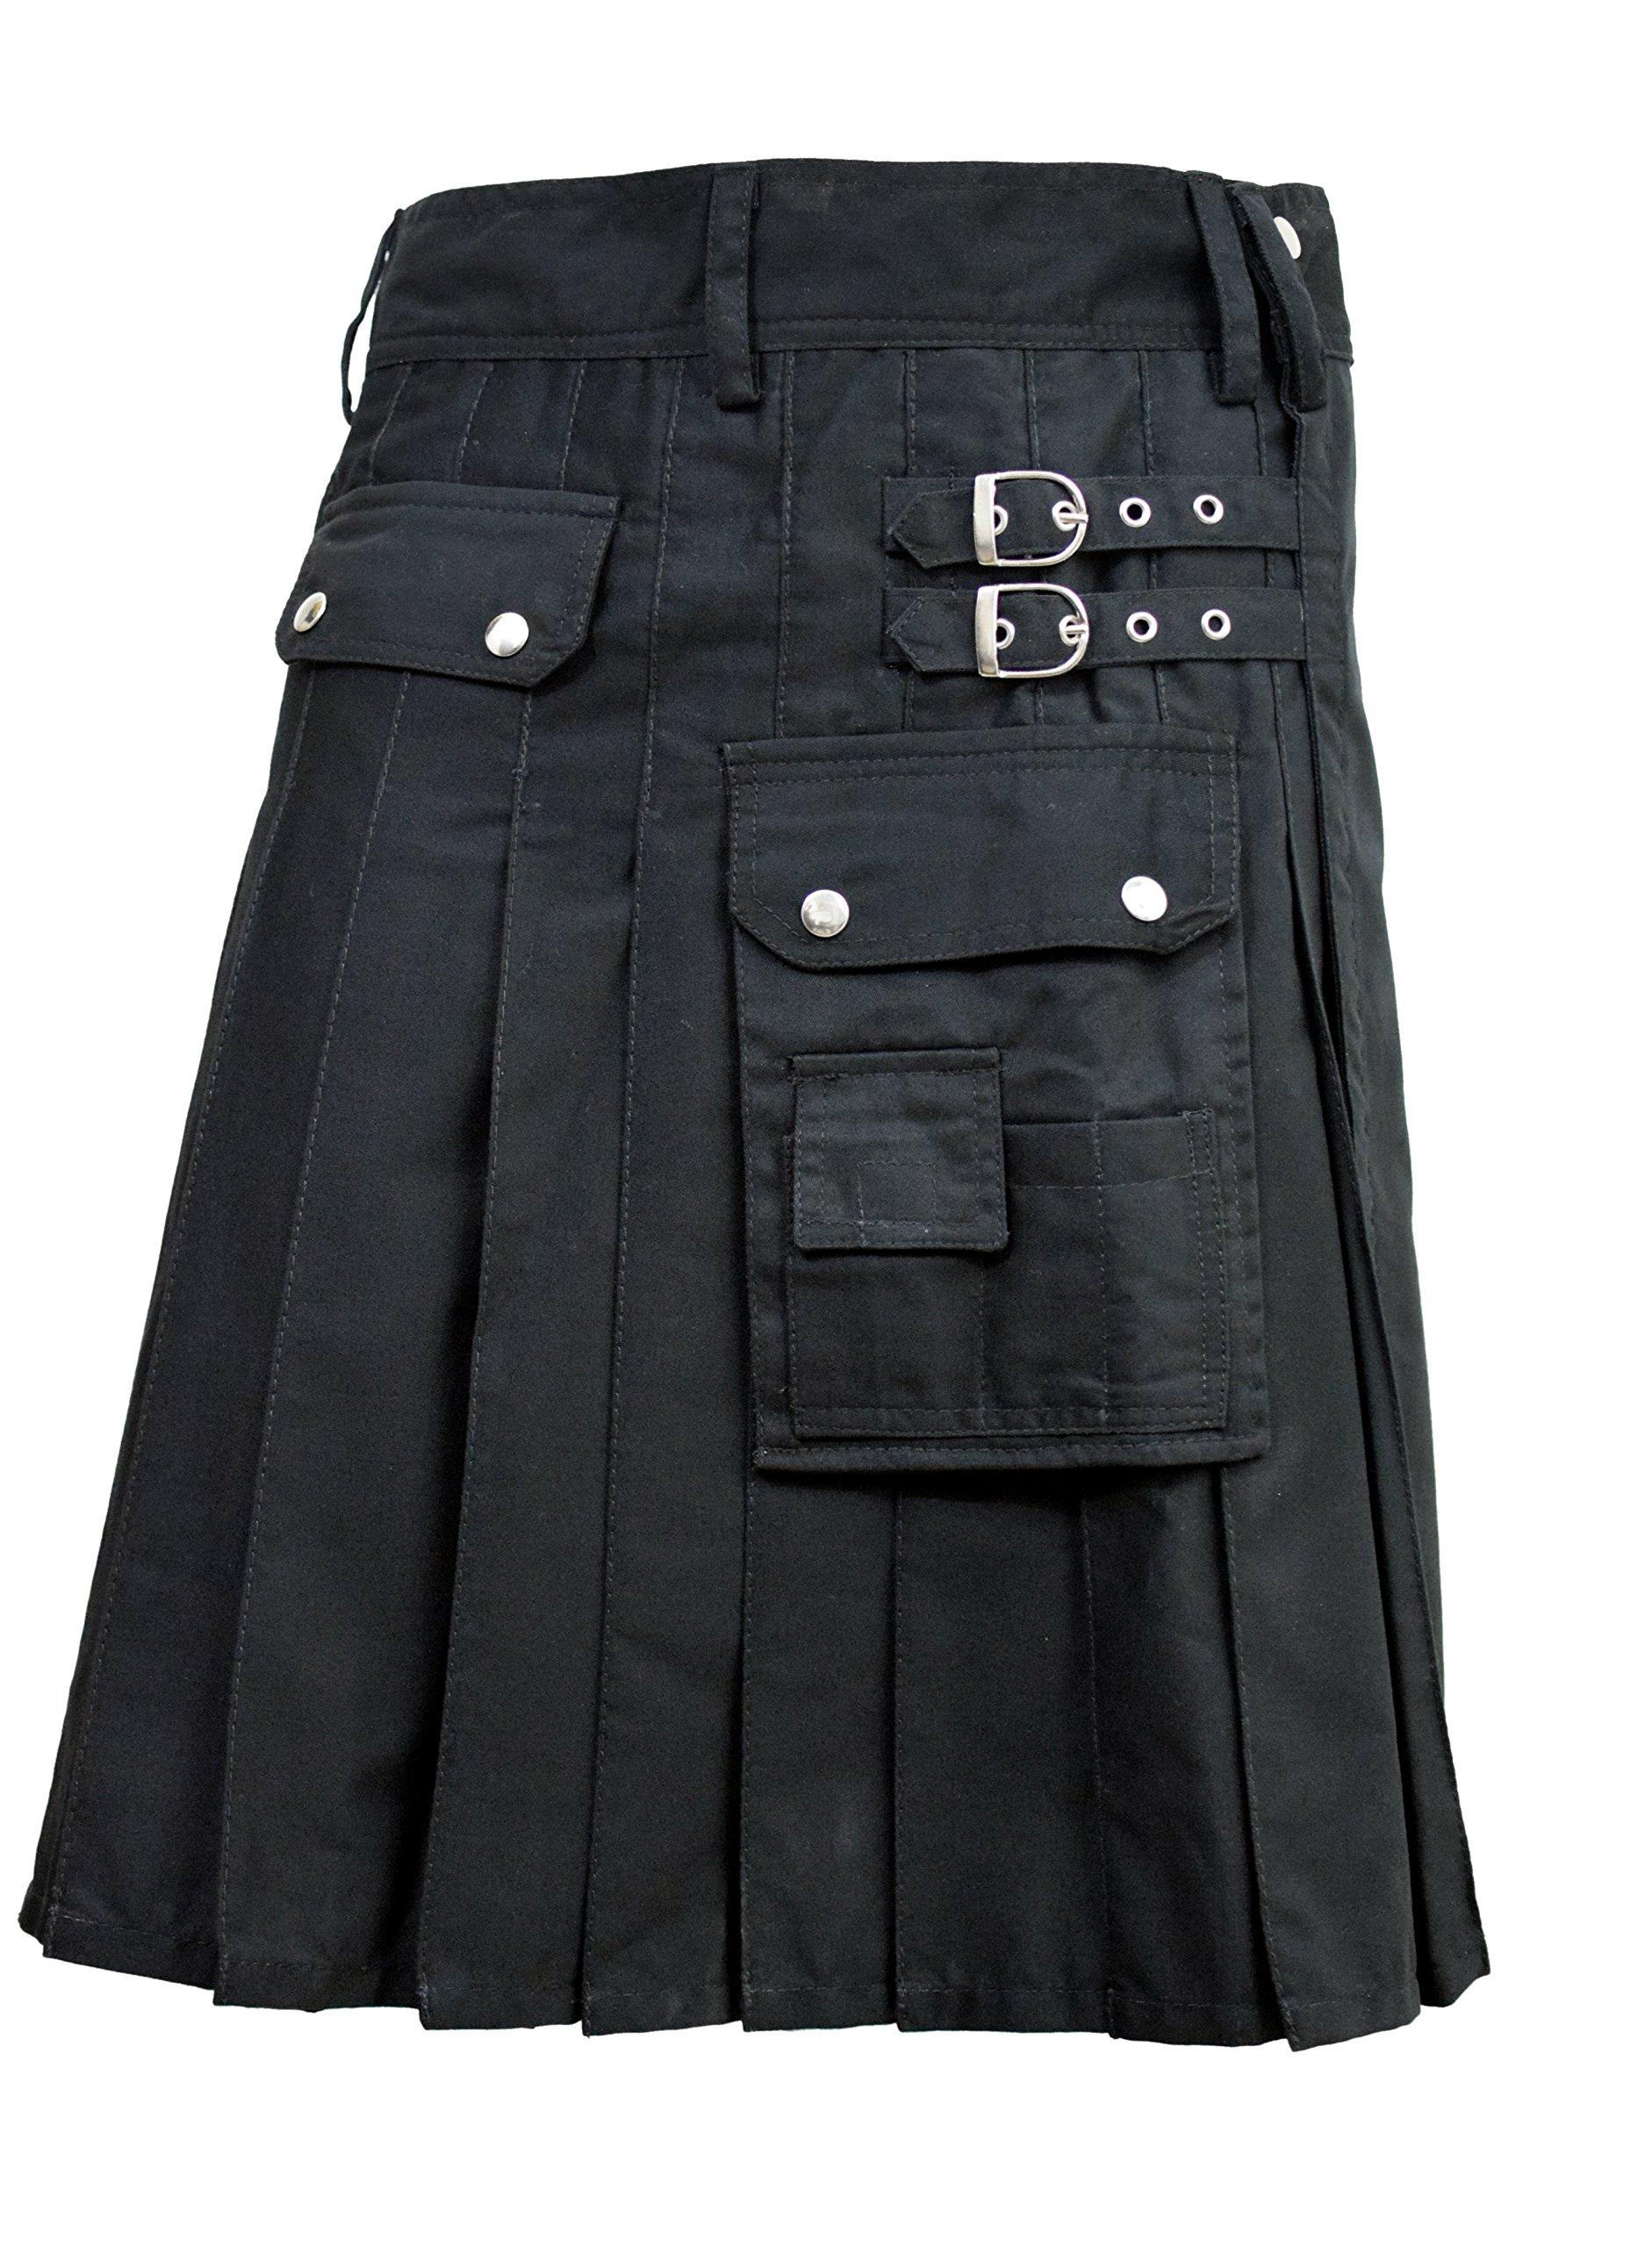 SHYNE_ENTERPRISES Alternative Utility Kilt Black Cotton Canvas All Sizes Modern Kilts (34'')